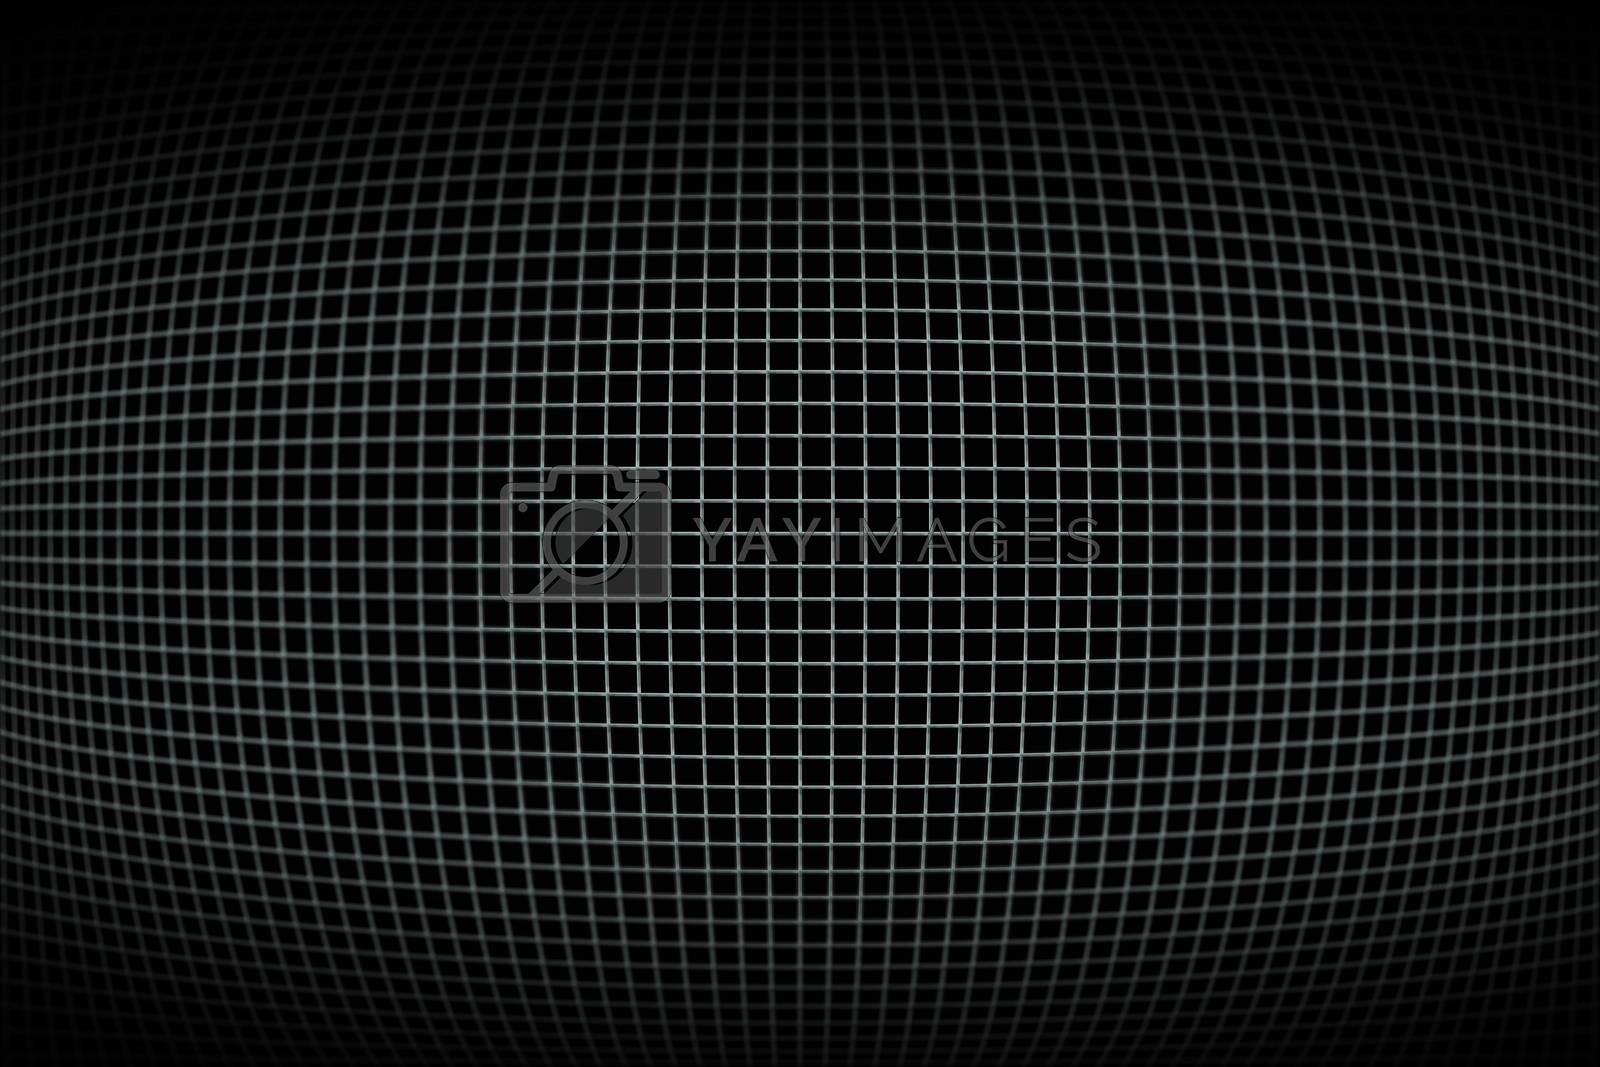 Royalty free image of Dark black and grey gird pattern by Wavebreakmedia